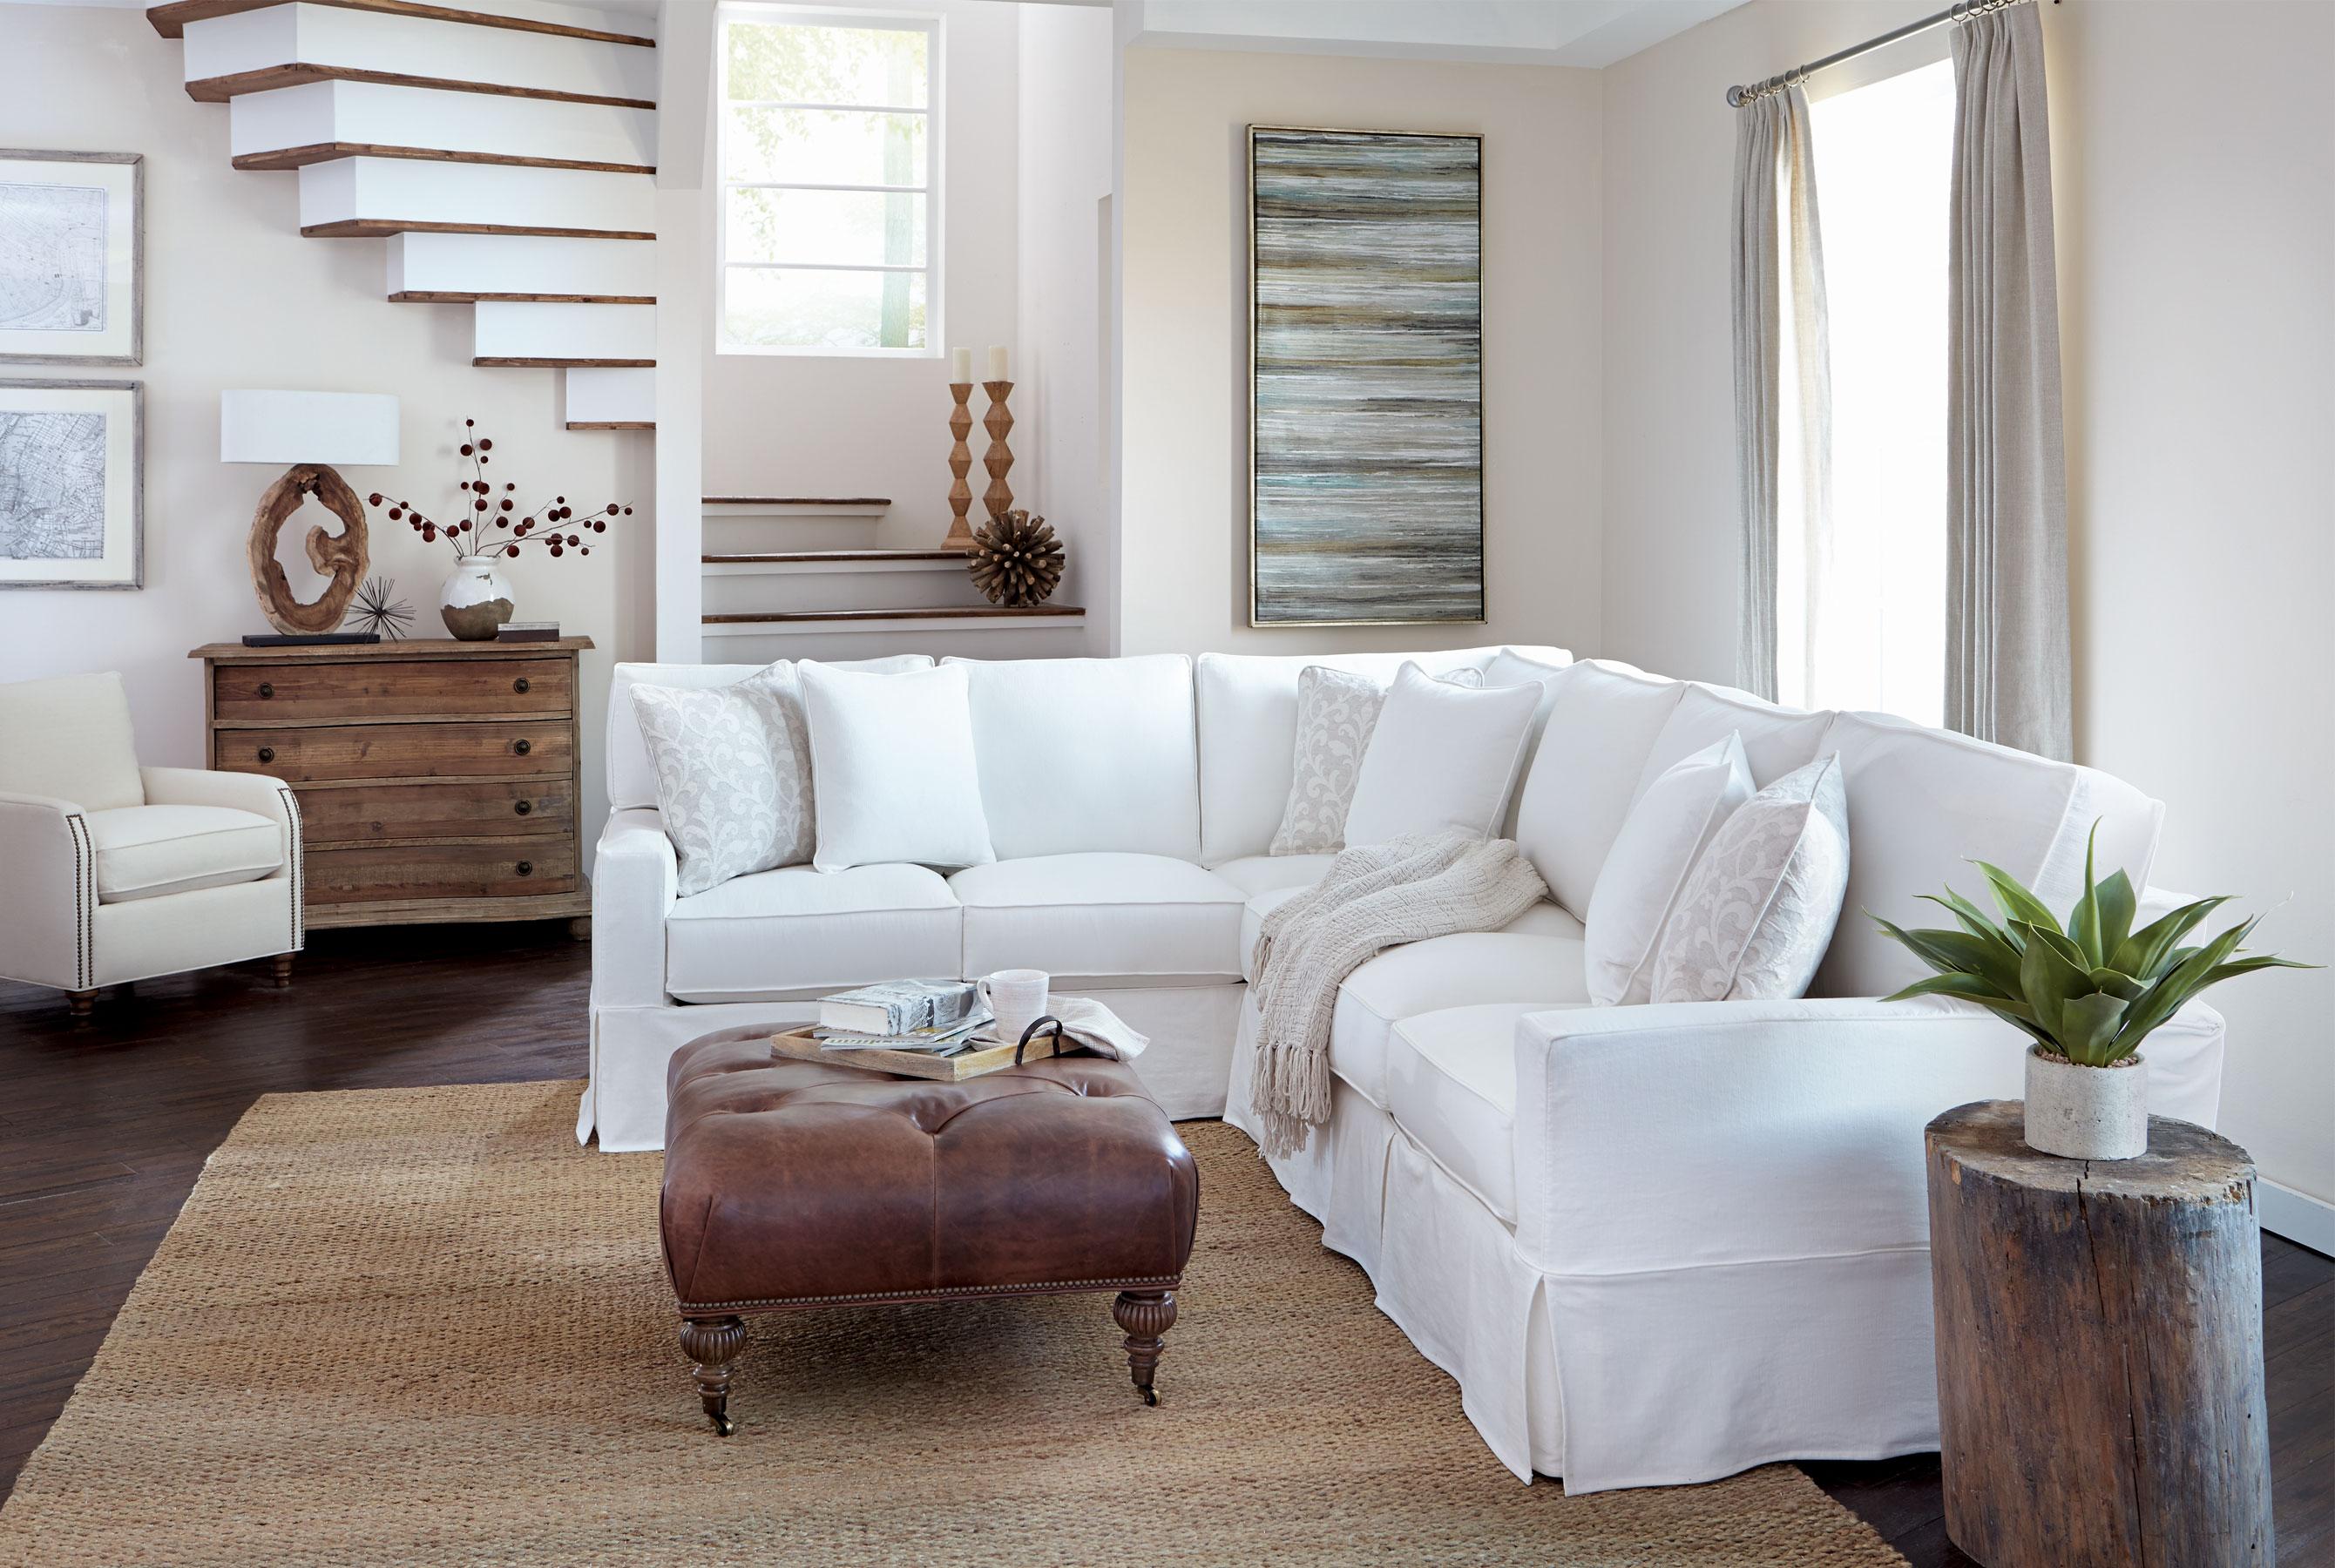 Miraculous Easton P278 Track Arm Slipcover Sectional Sofas And Sectionals Creativecarmelina Interior Chair Design Creativecarmelinacom